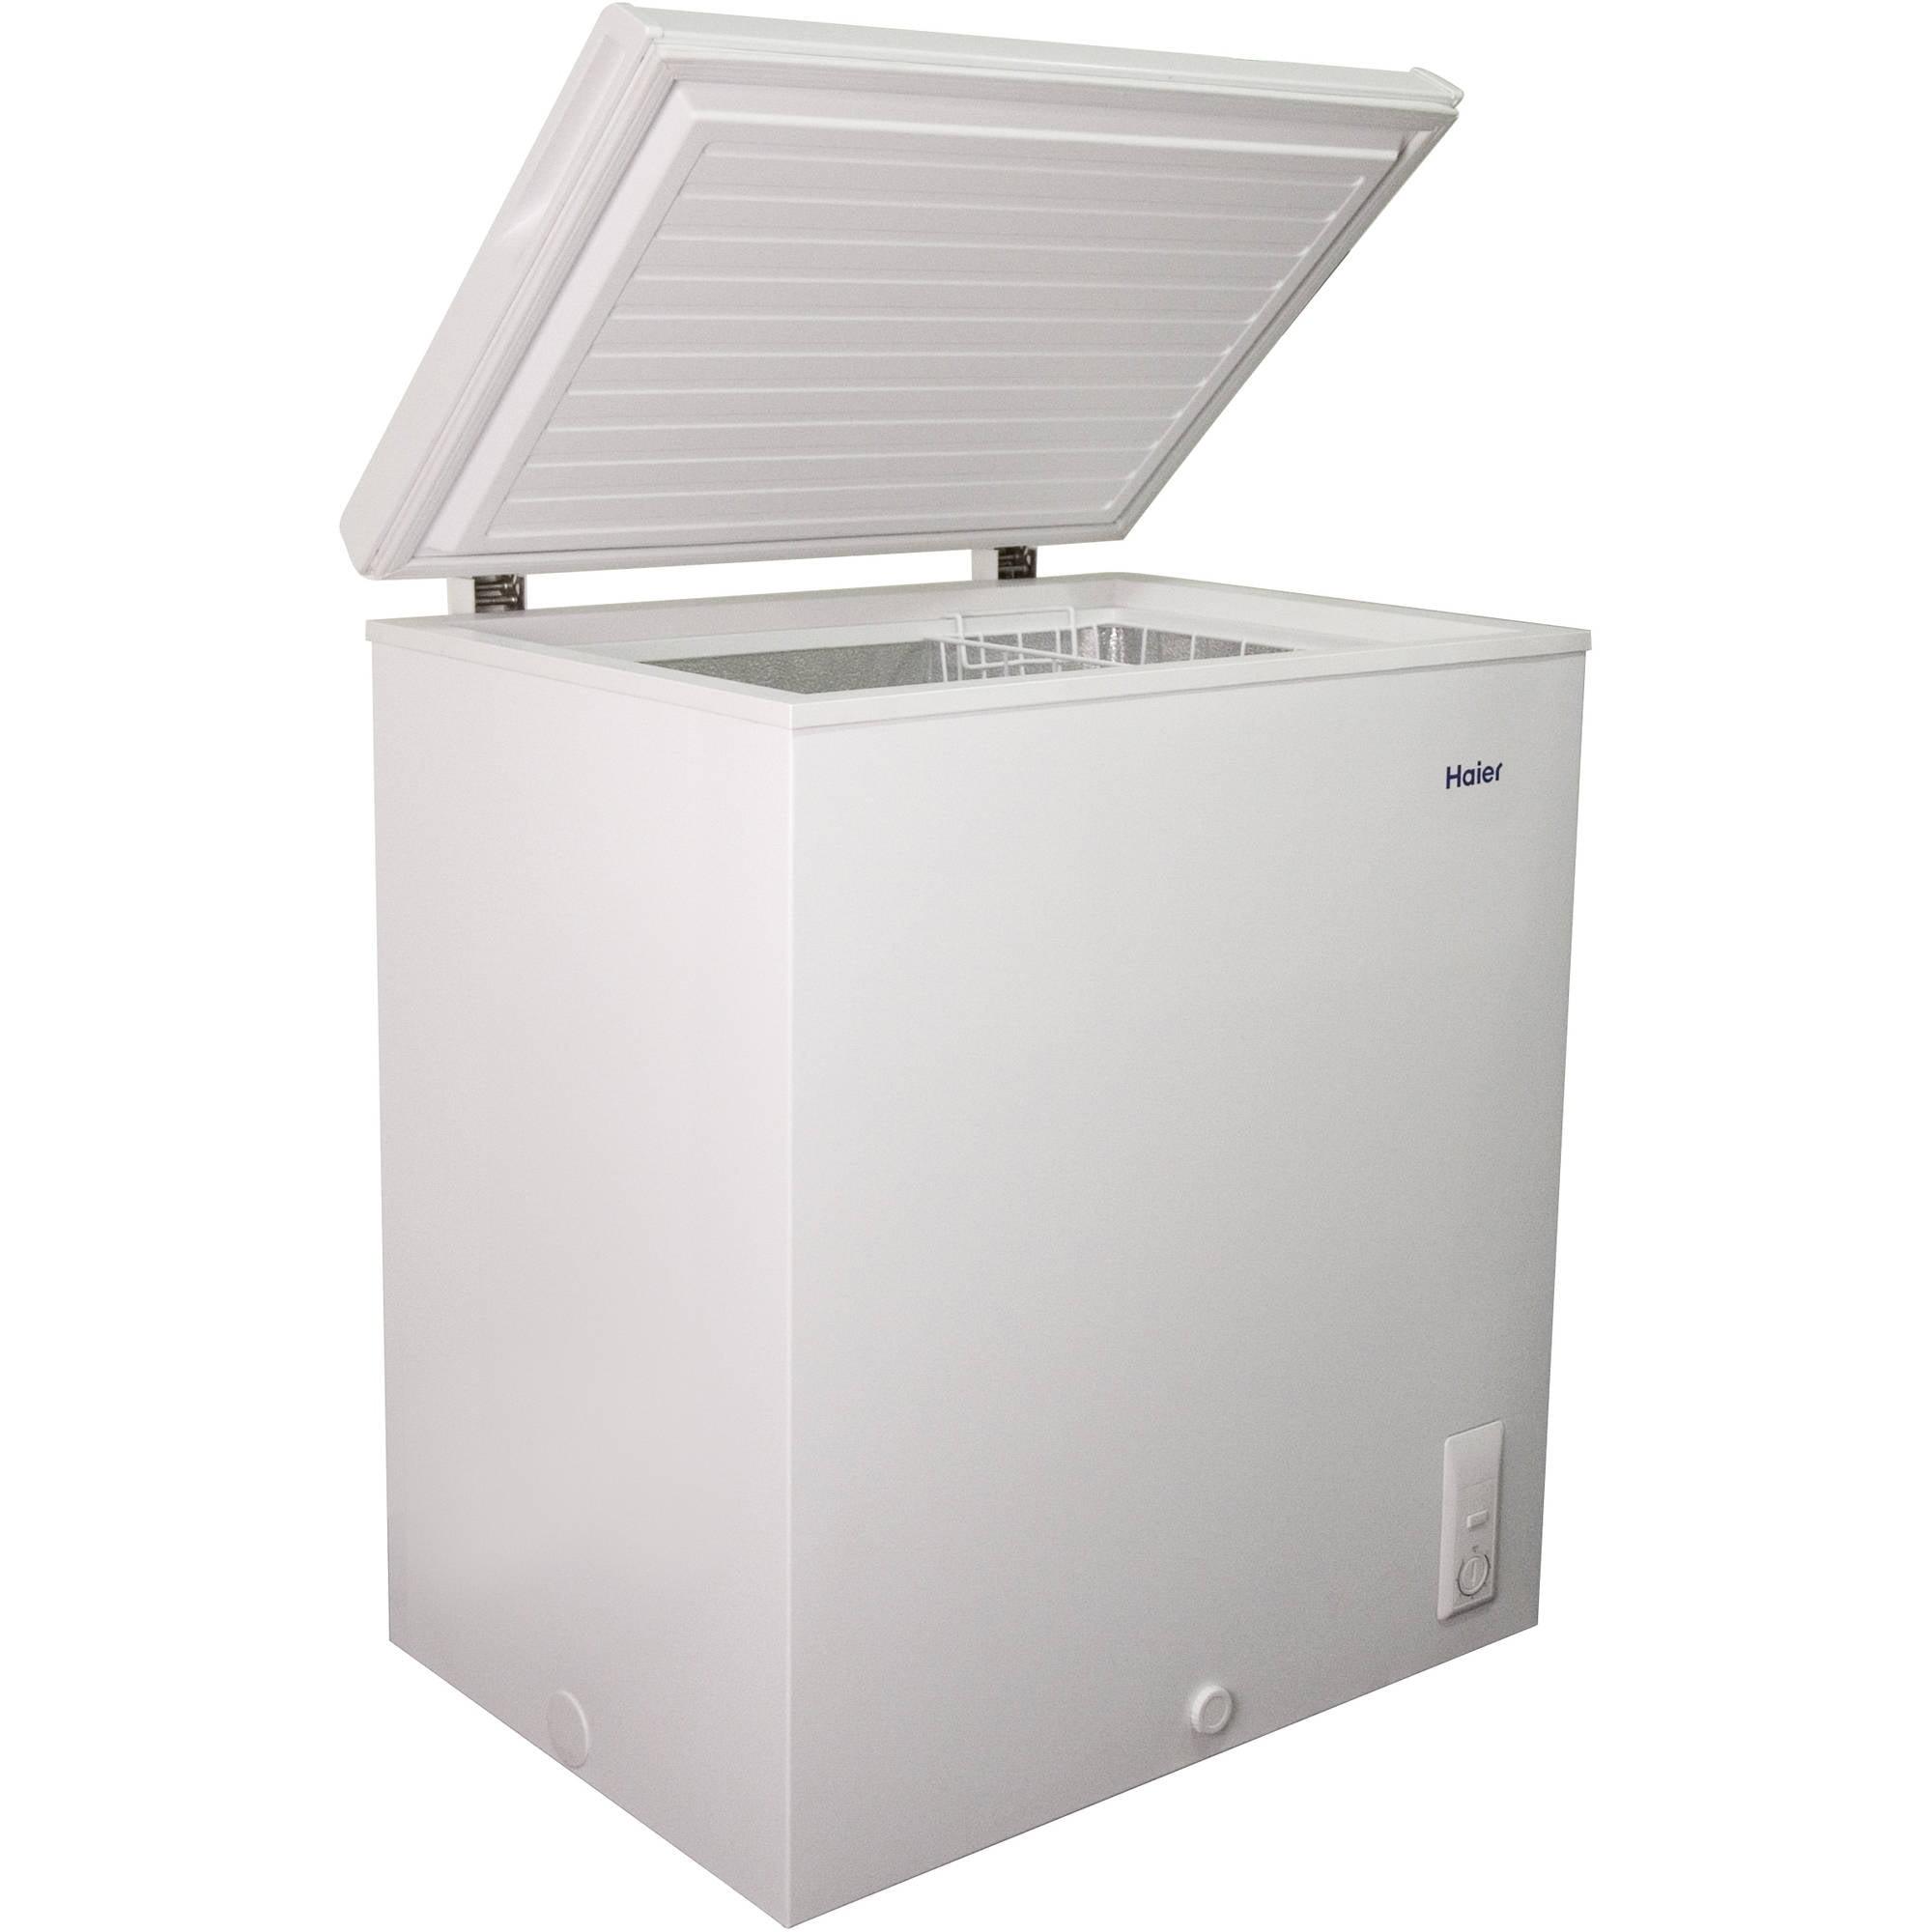 Haier 5.0 cu.ft. Capacity Chest Freezer, HF50CM23NW - Walmart.com on